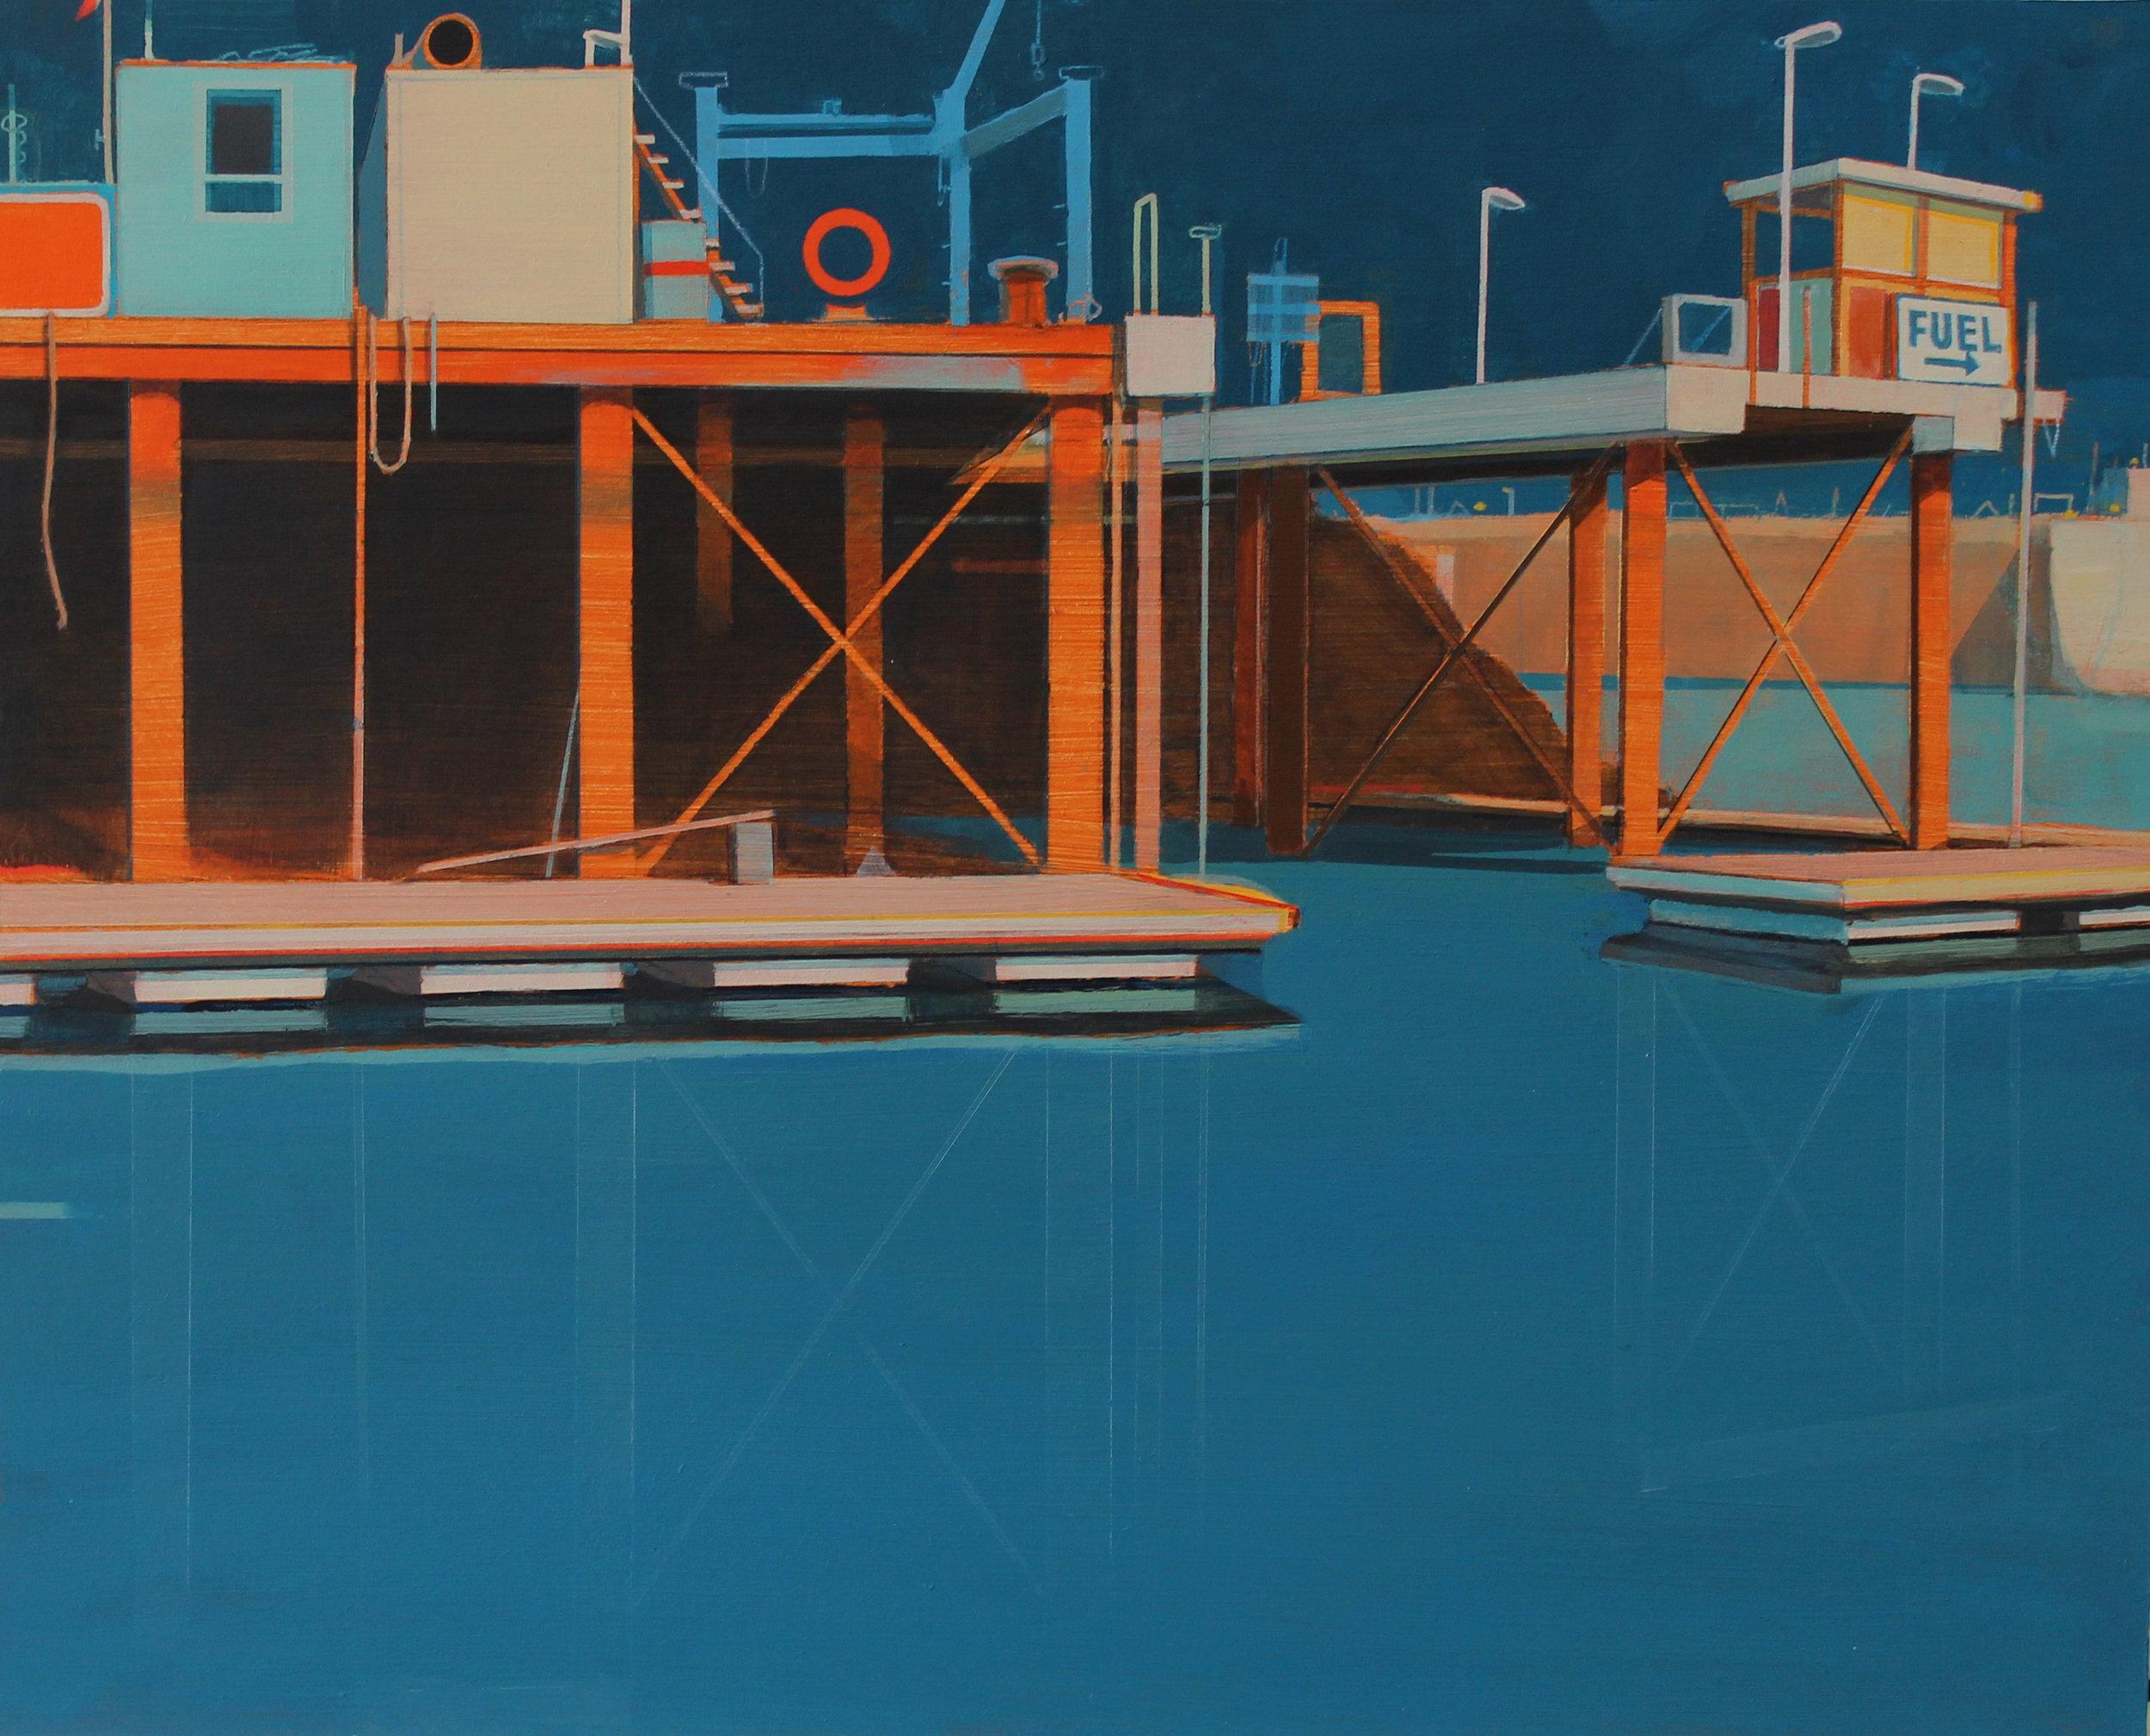 Dockyard, Plymouth.